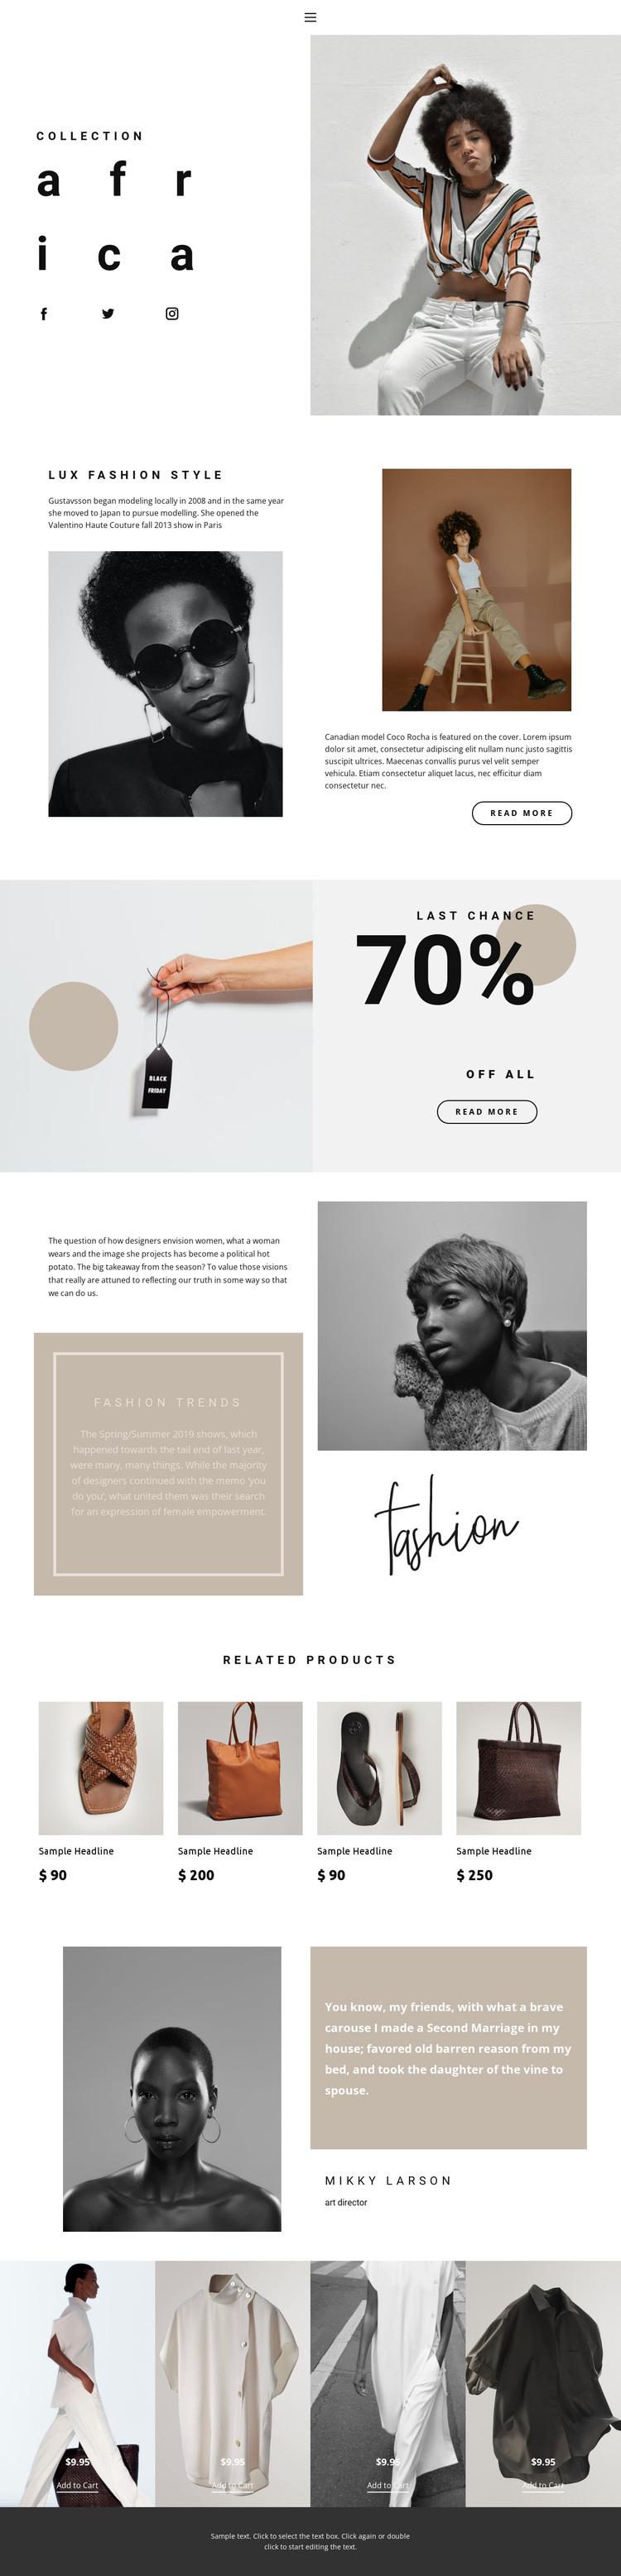 Fashion ideas and advance Web Design